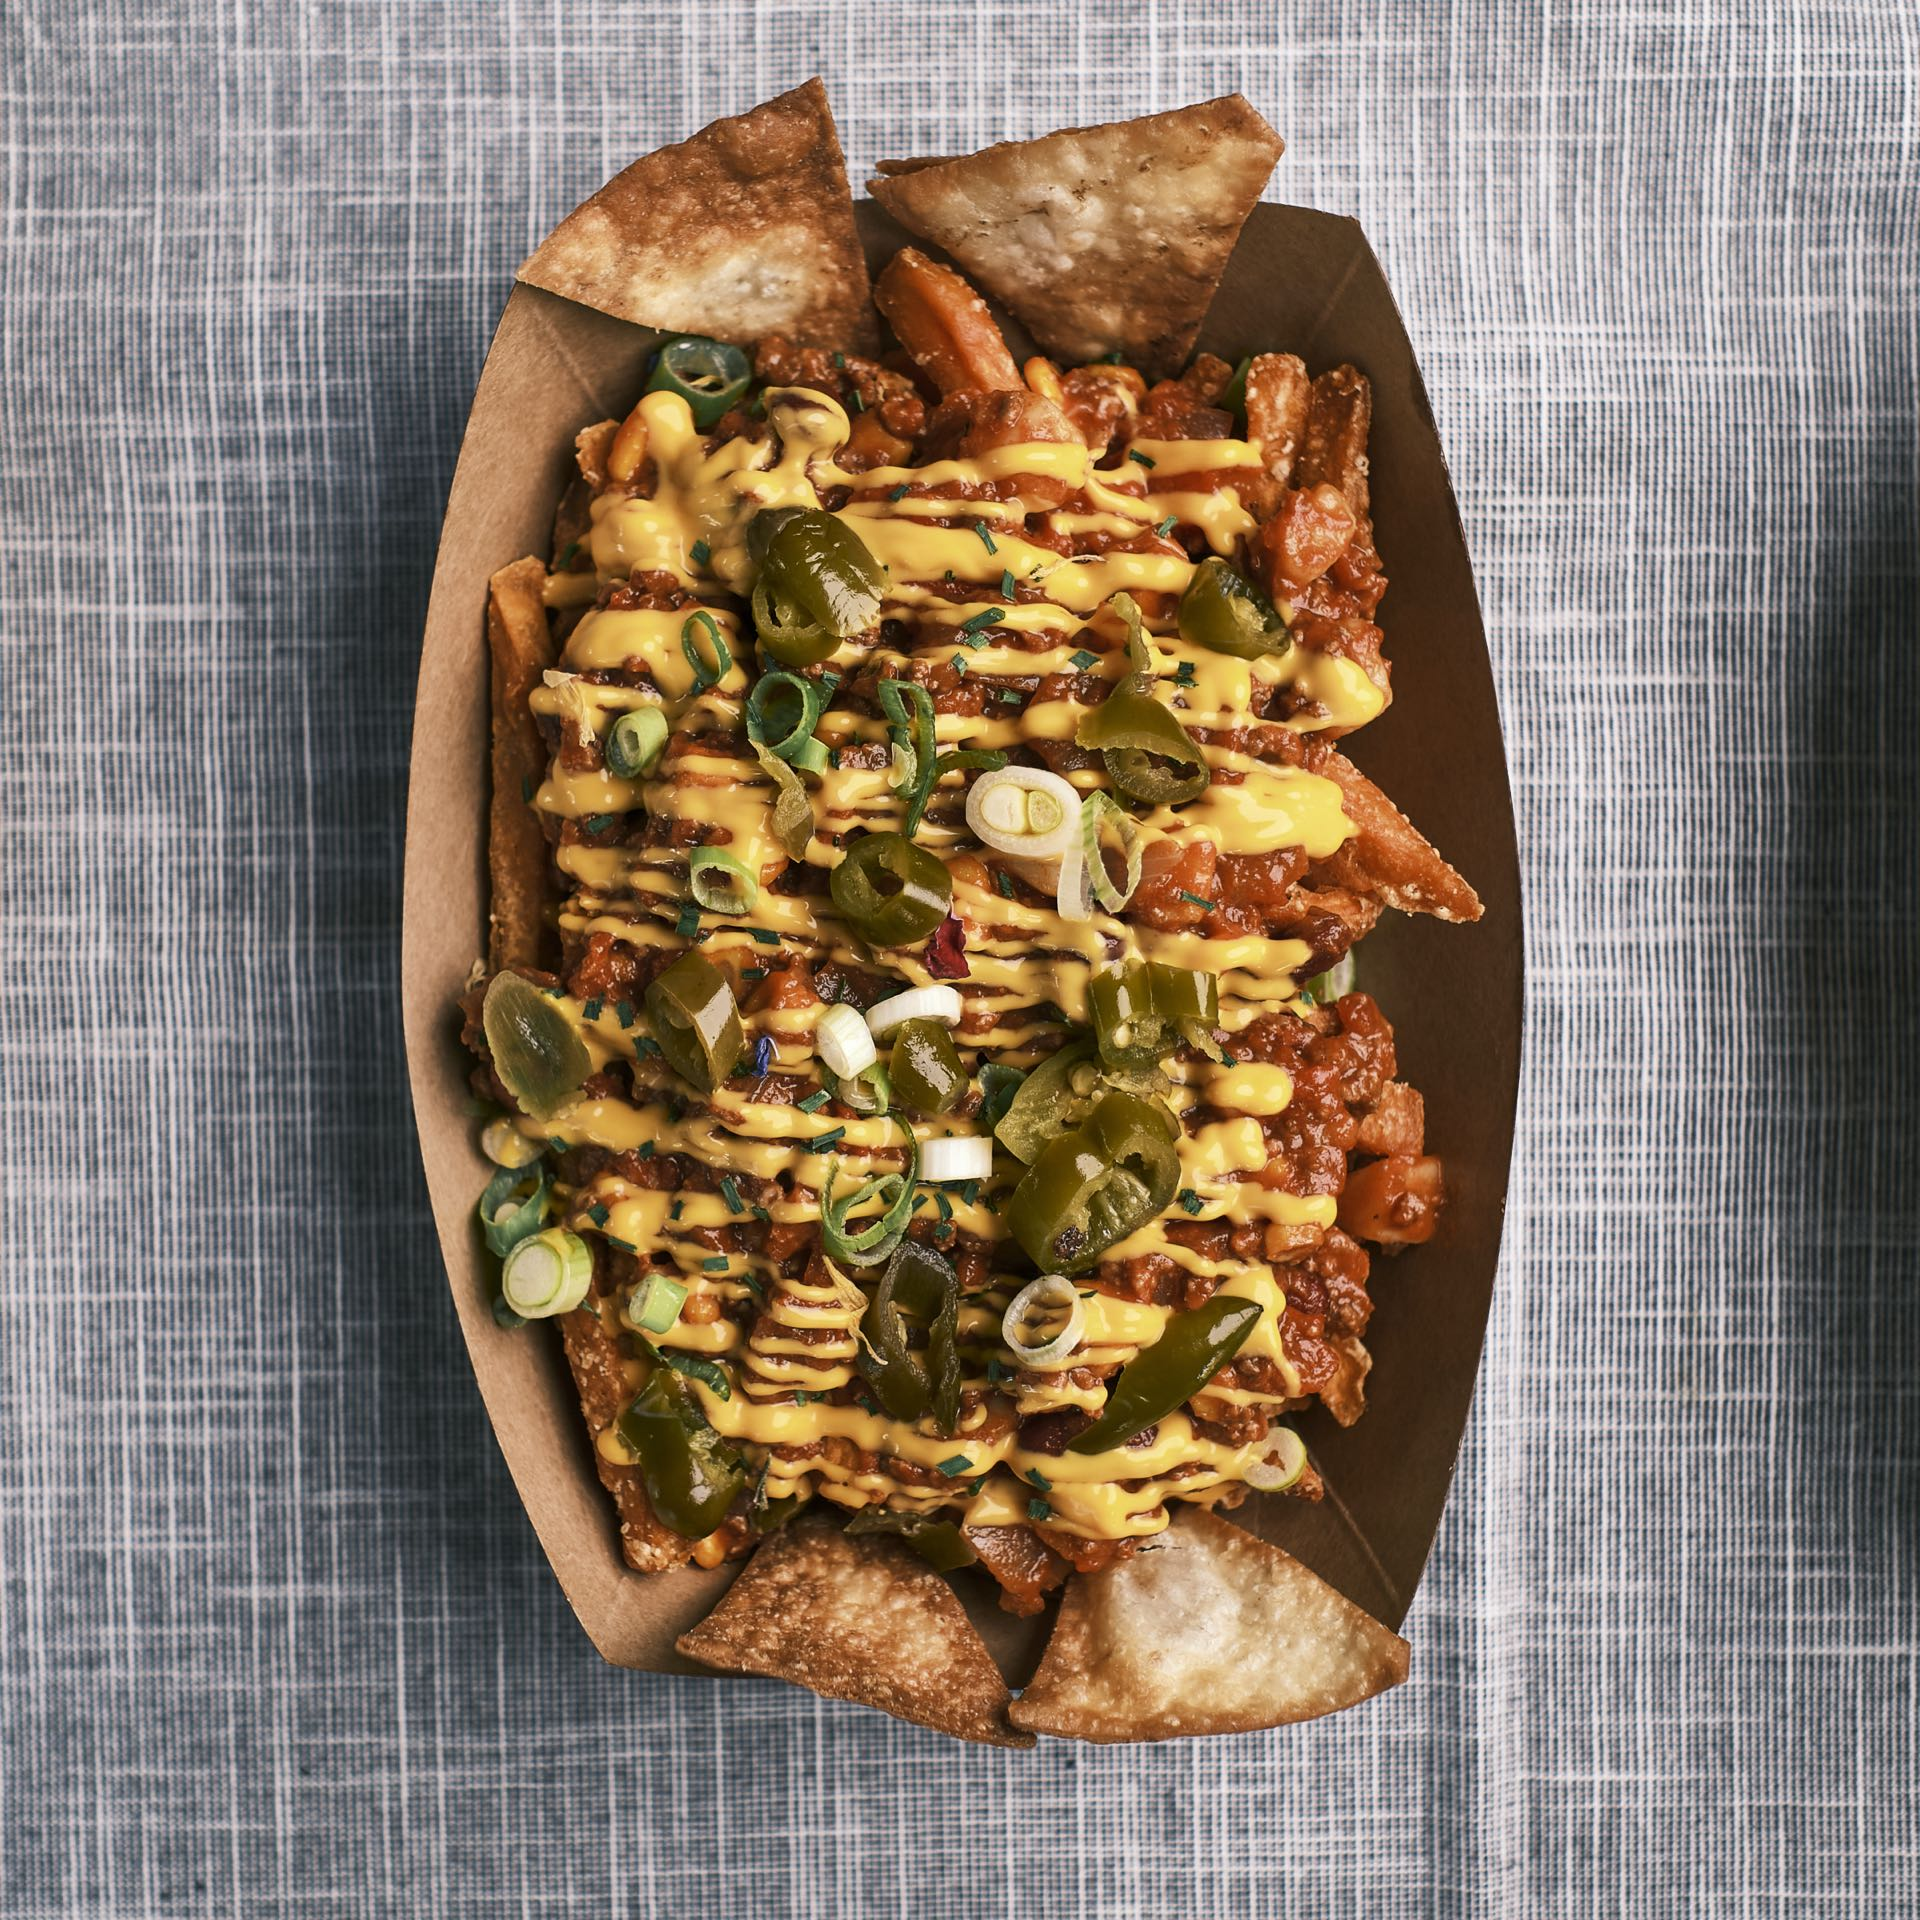 Sweet Potato Chili Cheese Fries